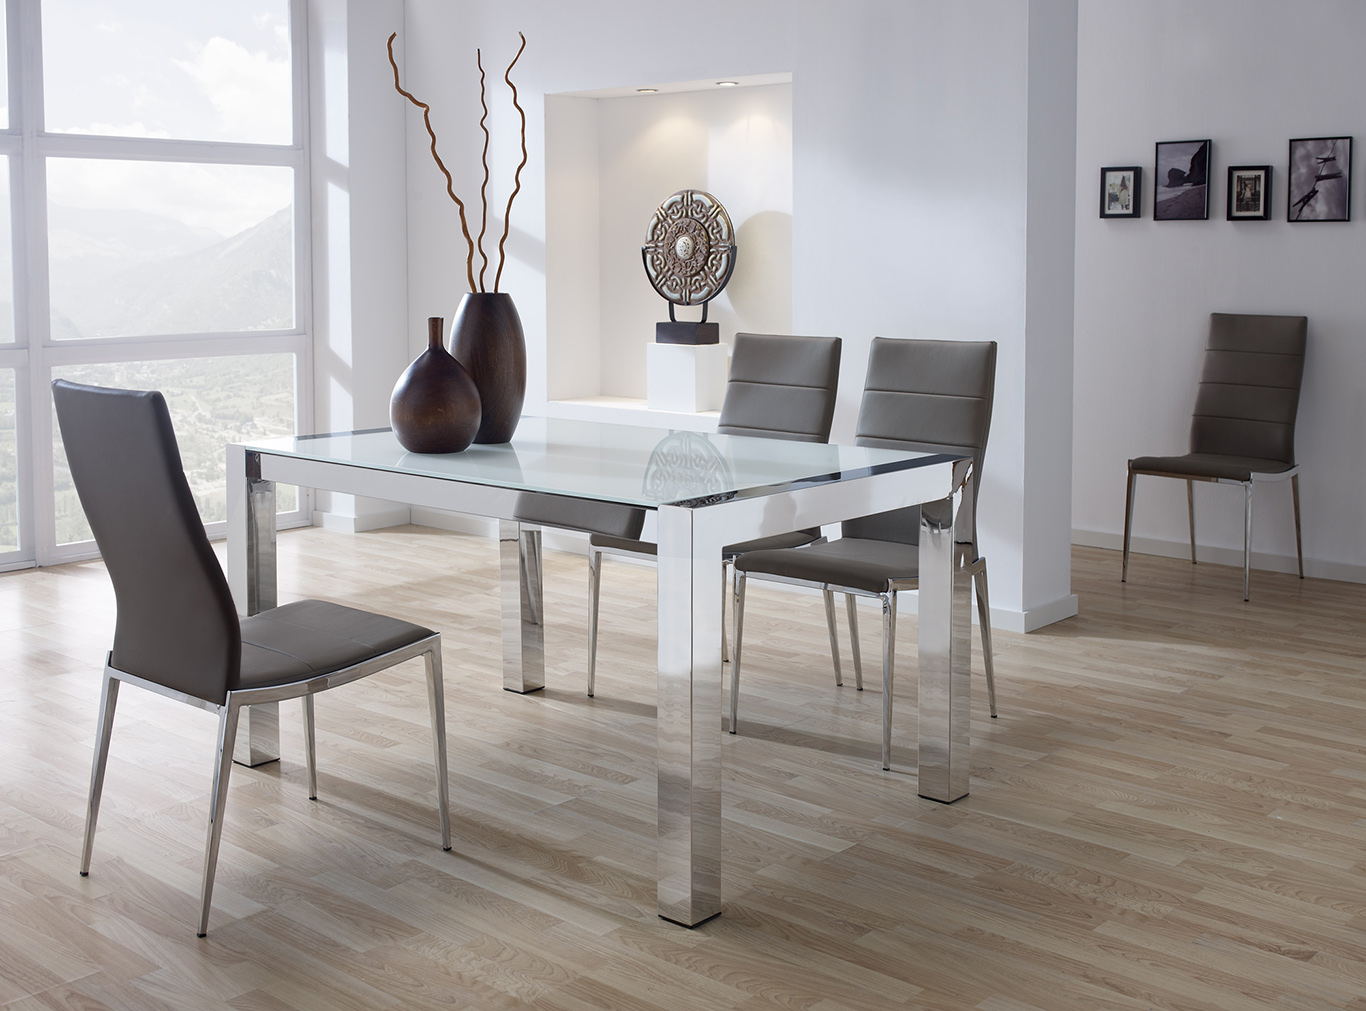 Mesas de comedor modernas for Mesas y sillas para comedor